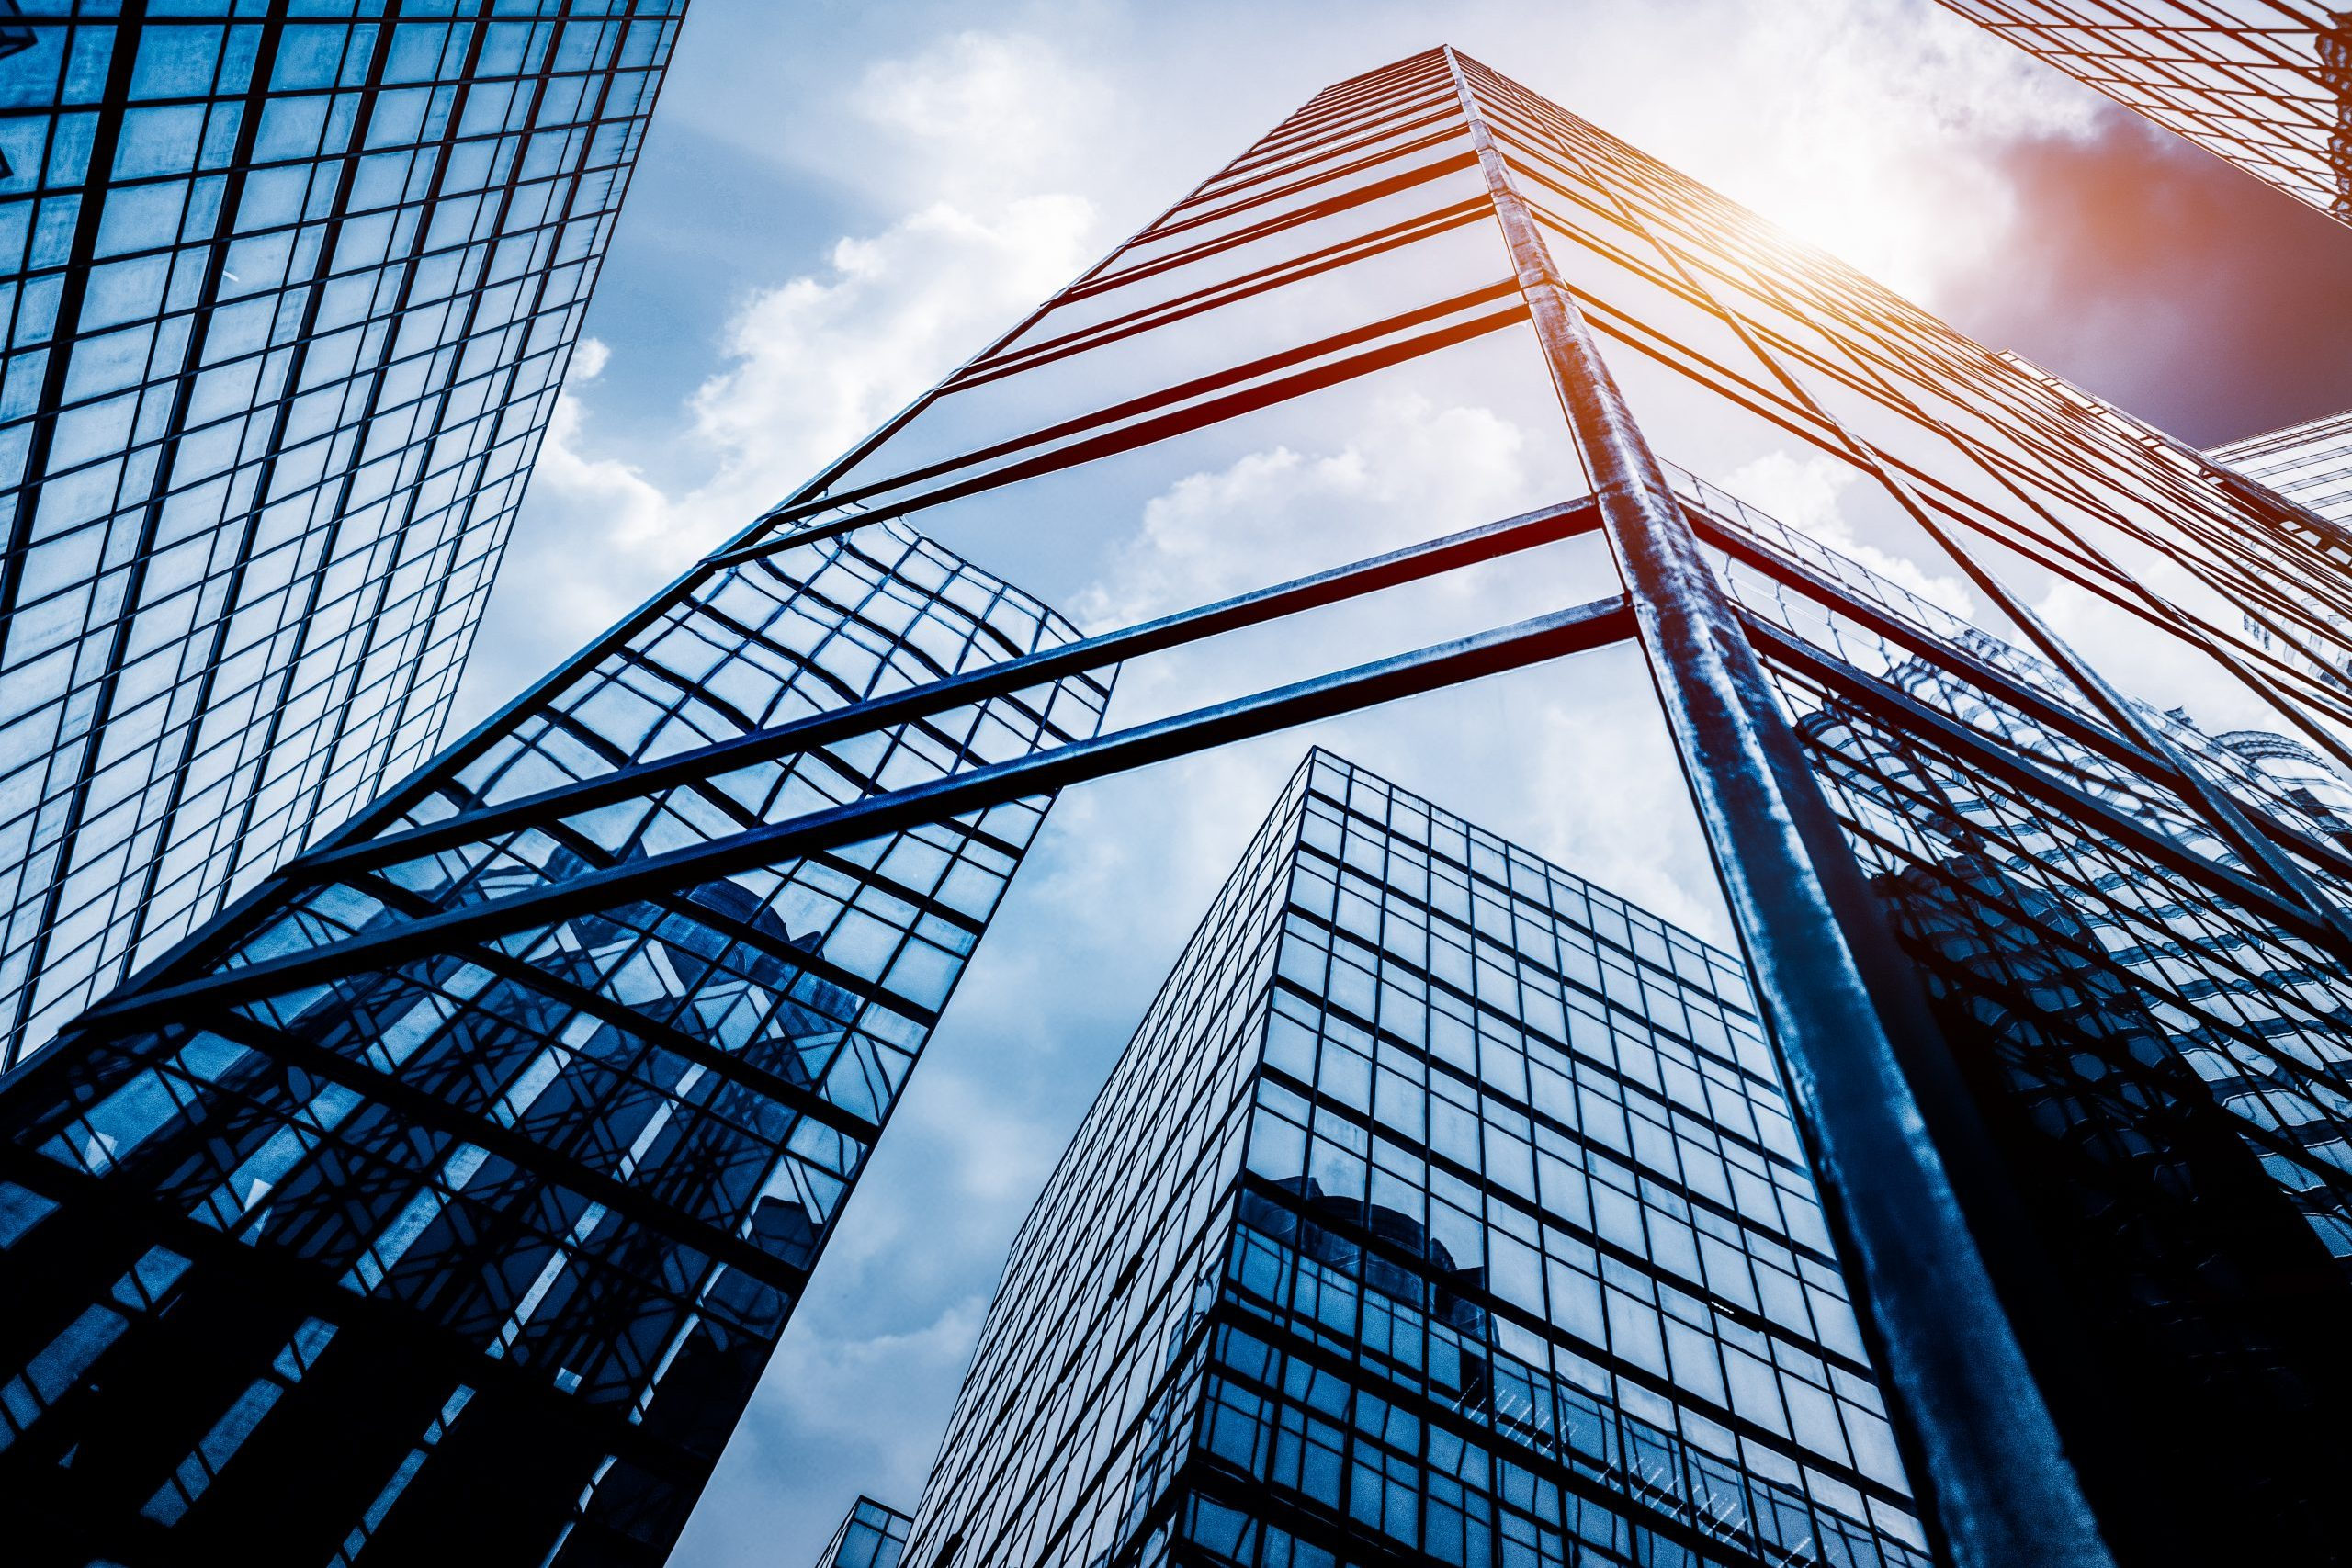 rmda-ss-finance-industry-building.2560.1709